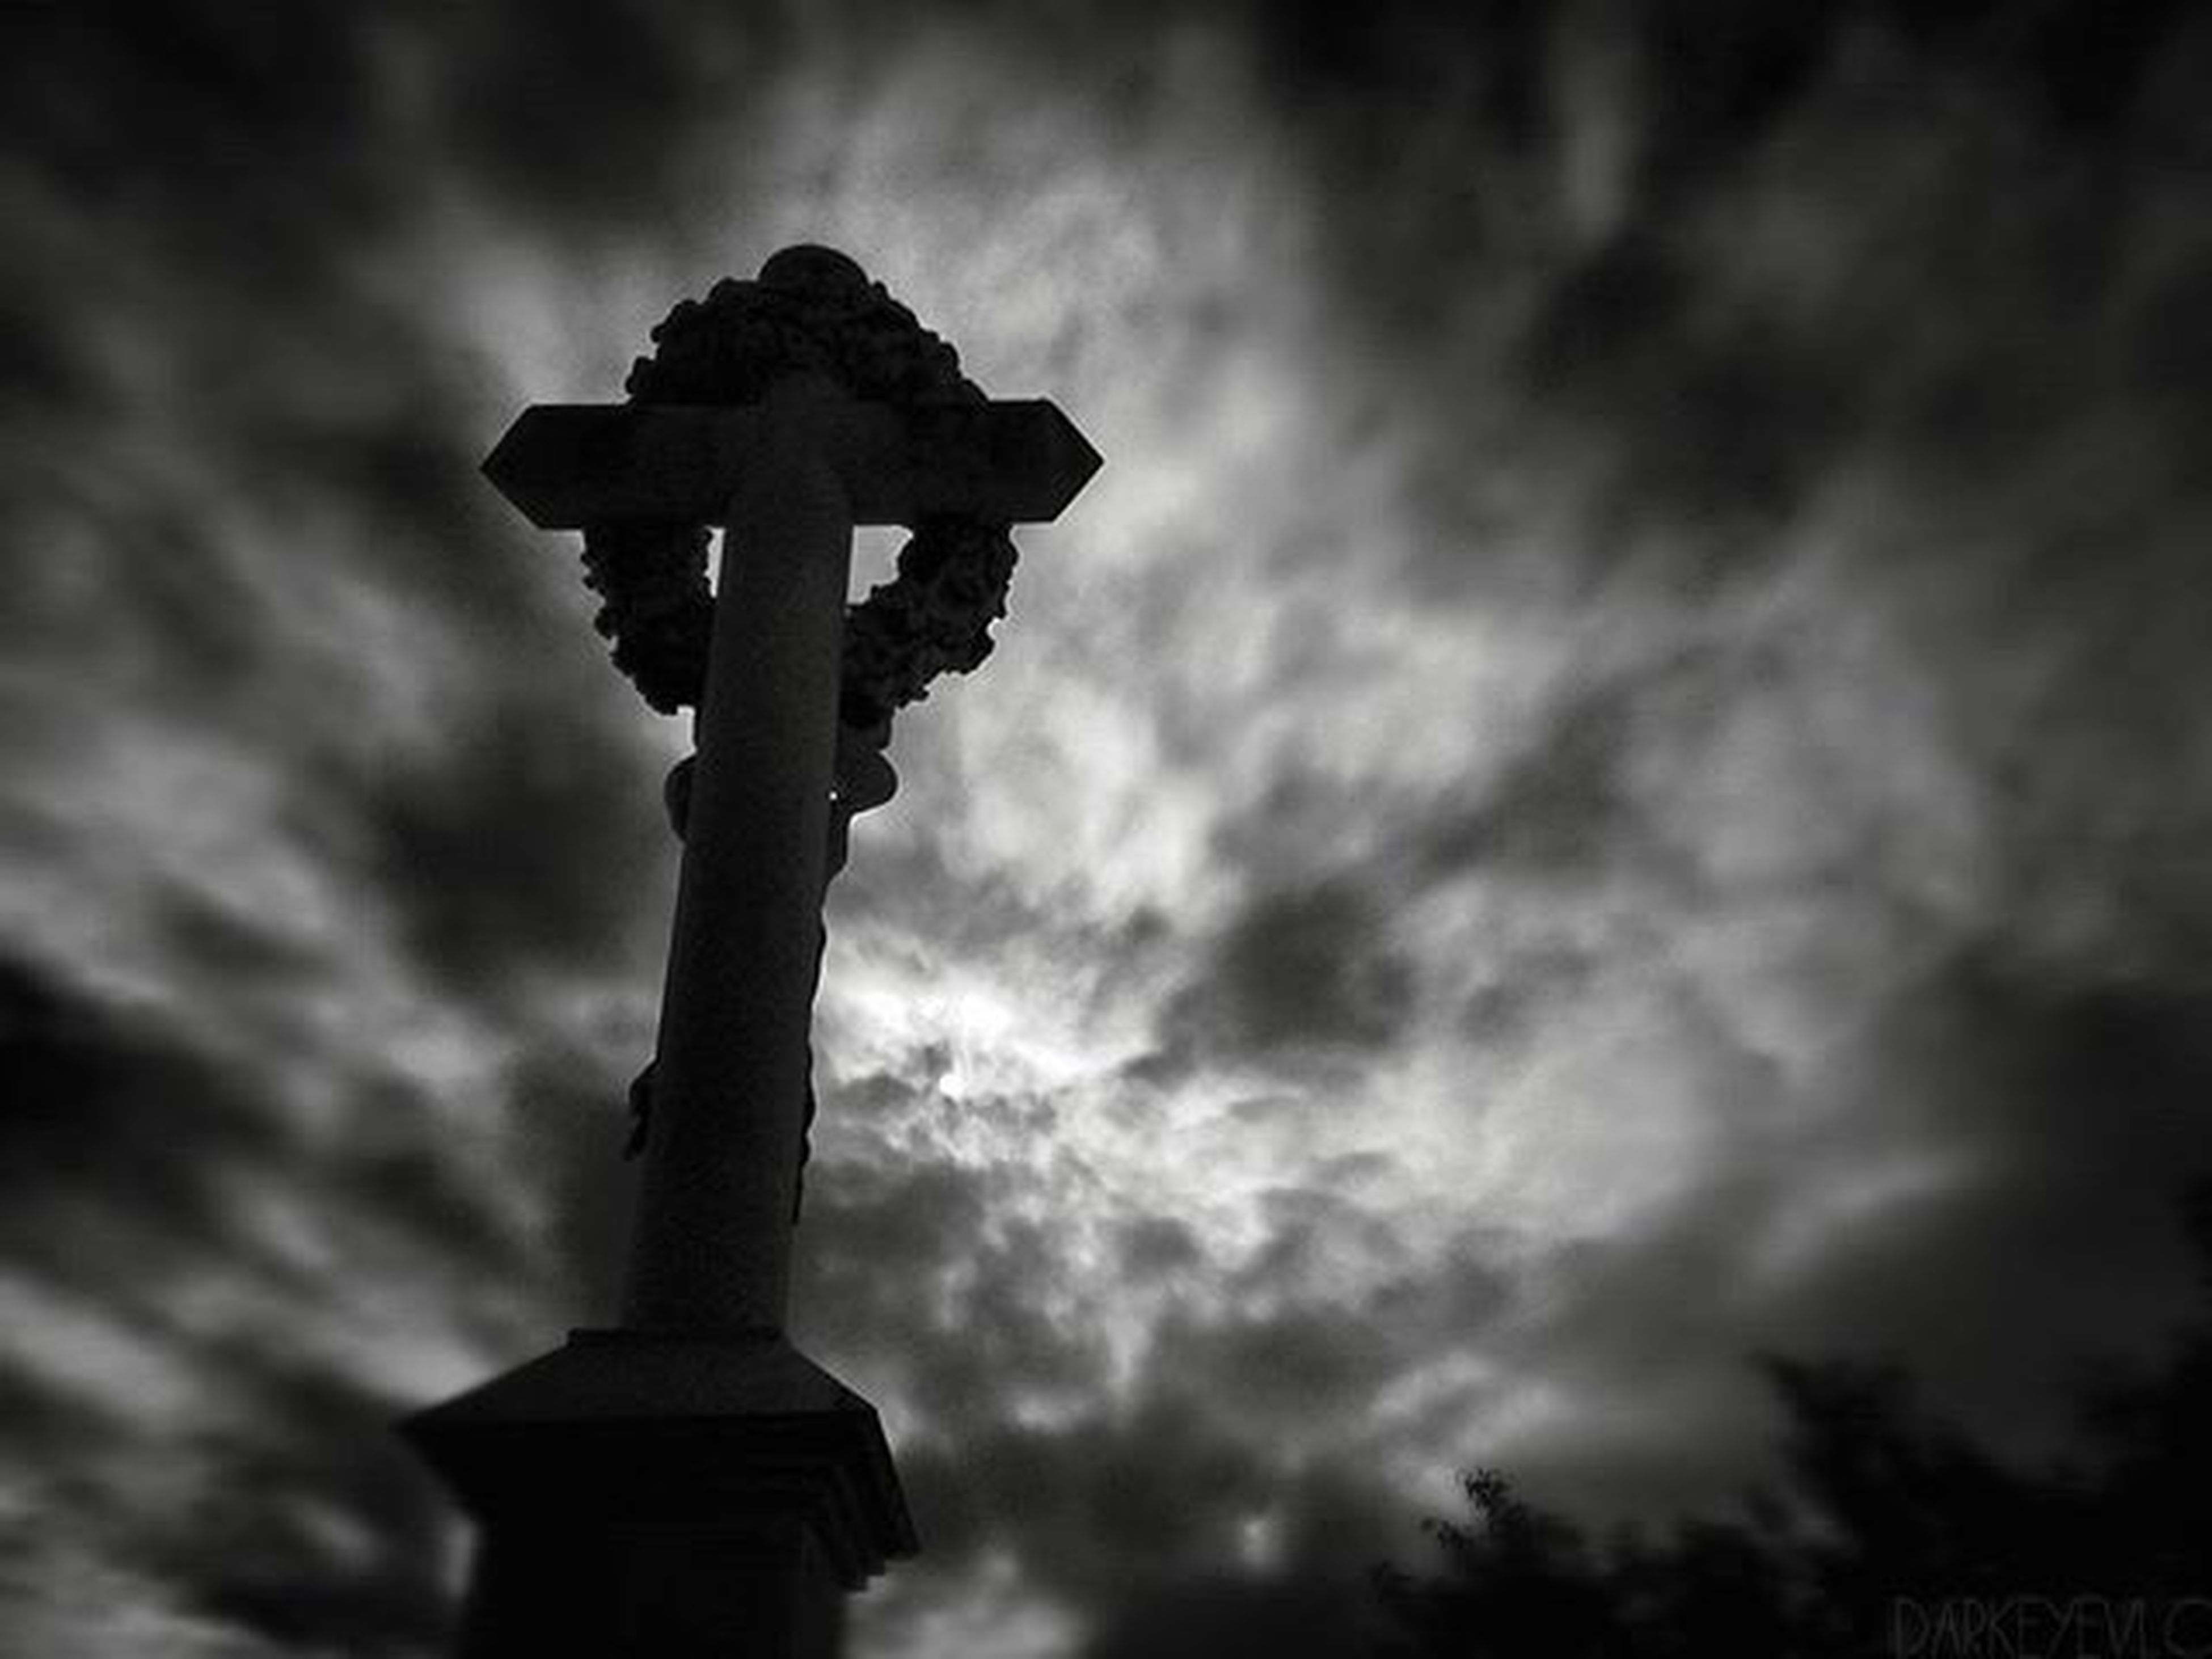 Graveyard_dead GYD_black_friday Bnw_oftheworld Blackandwhite Sky Clouds Bnw Cementiry Darkphotography Sky Porn Landscape Bnwphotography Graveyard_shots